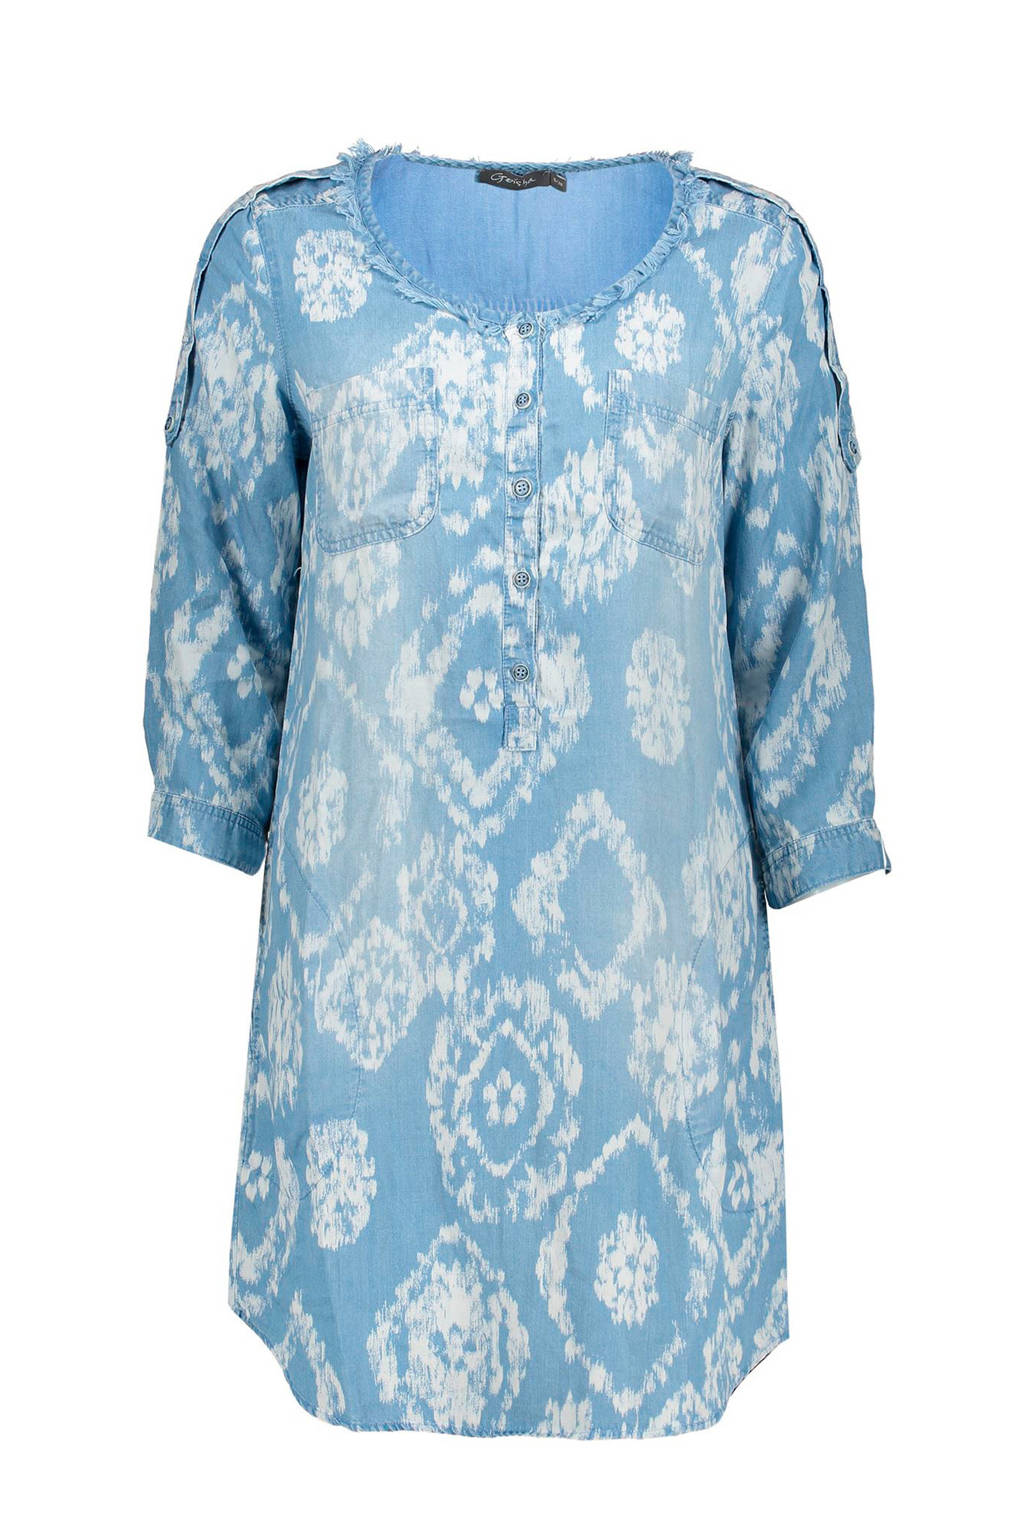 Geisha geweven tuniek met all over print lichtblauw, Lichtblauw